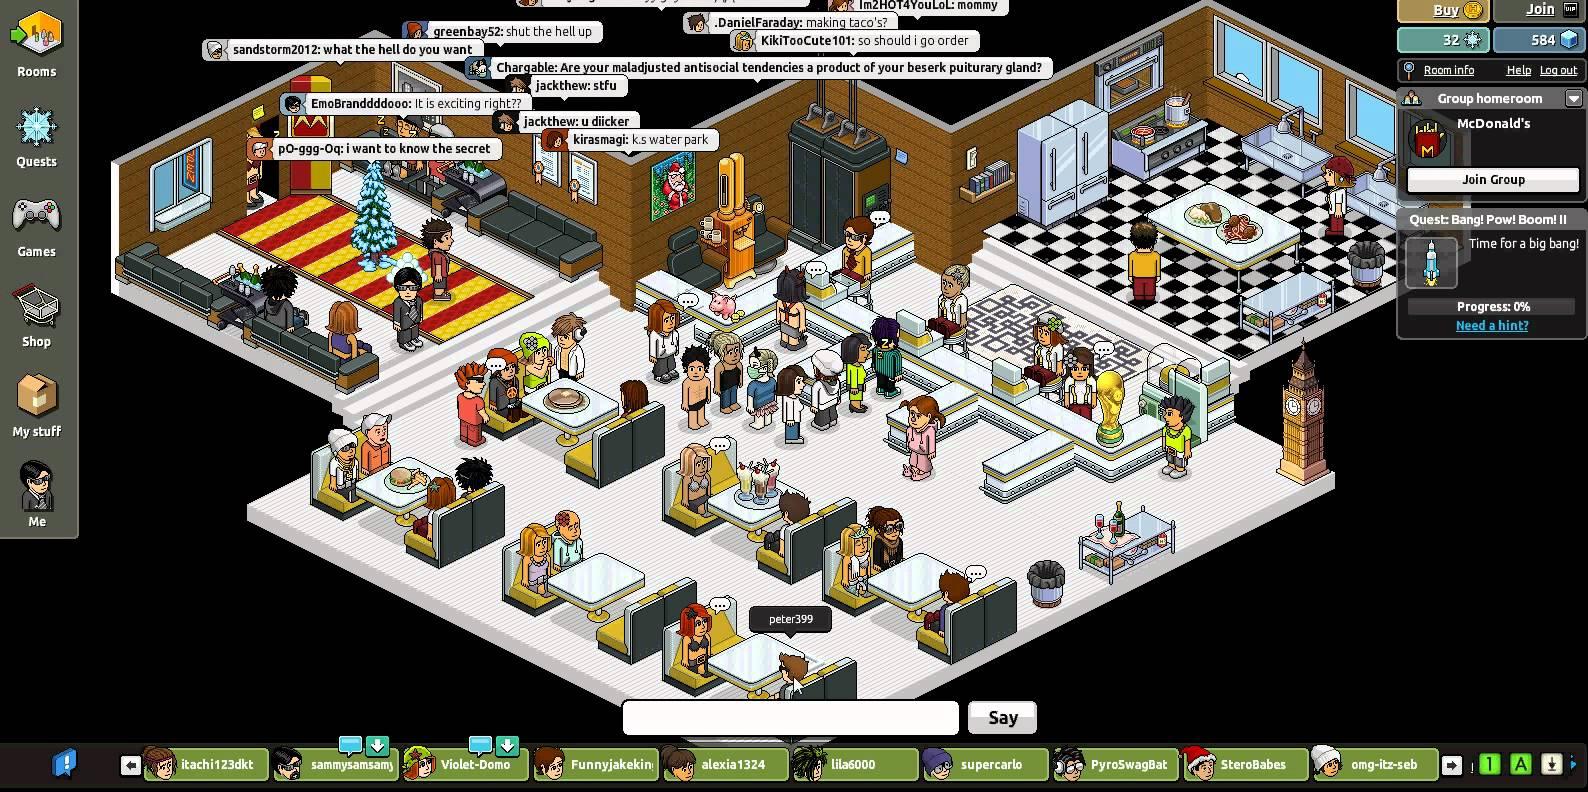 13 Mundos Virtuales Entretenidos Y Educativos Para Ninos Ounae